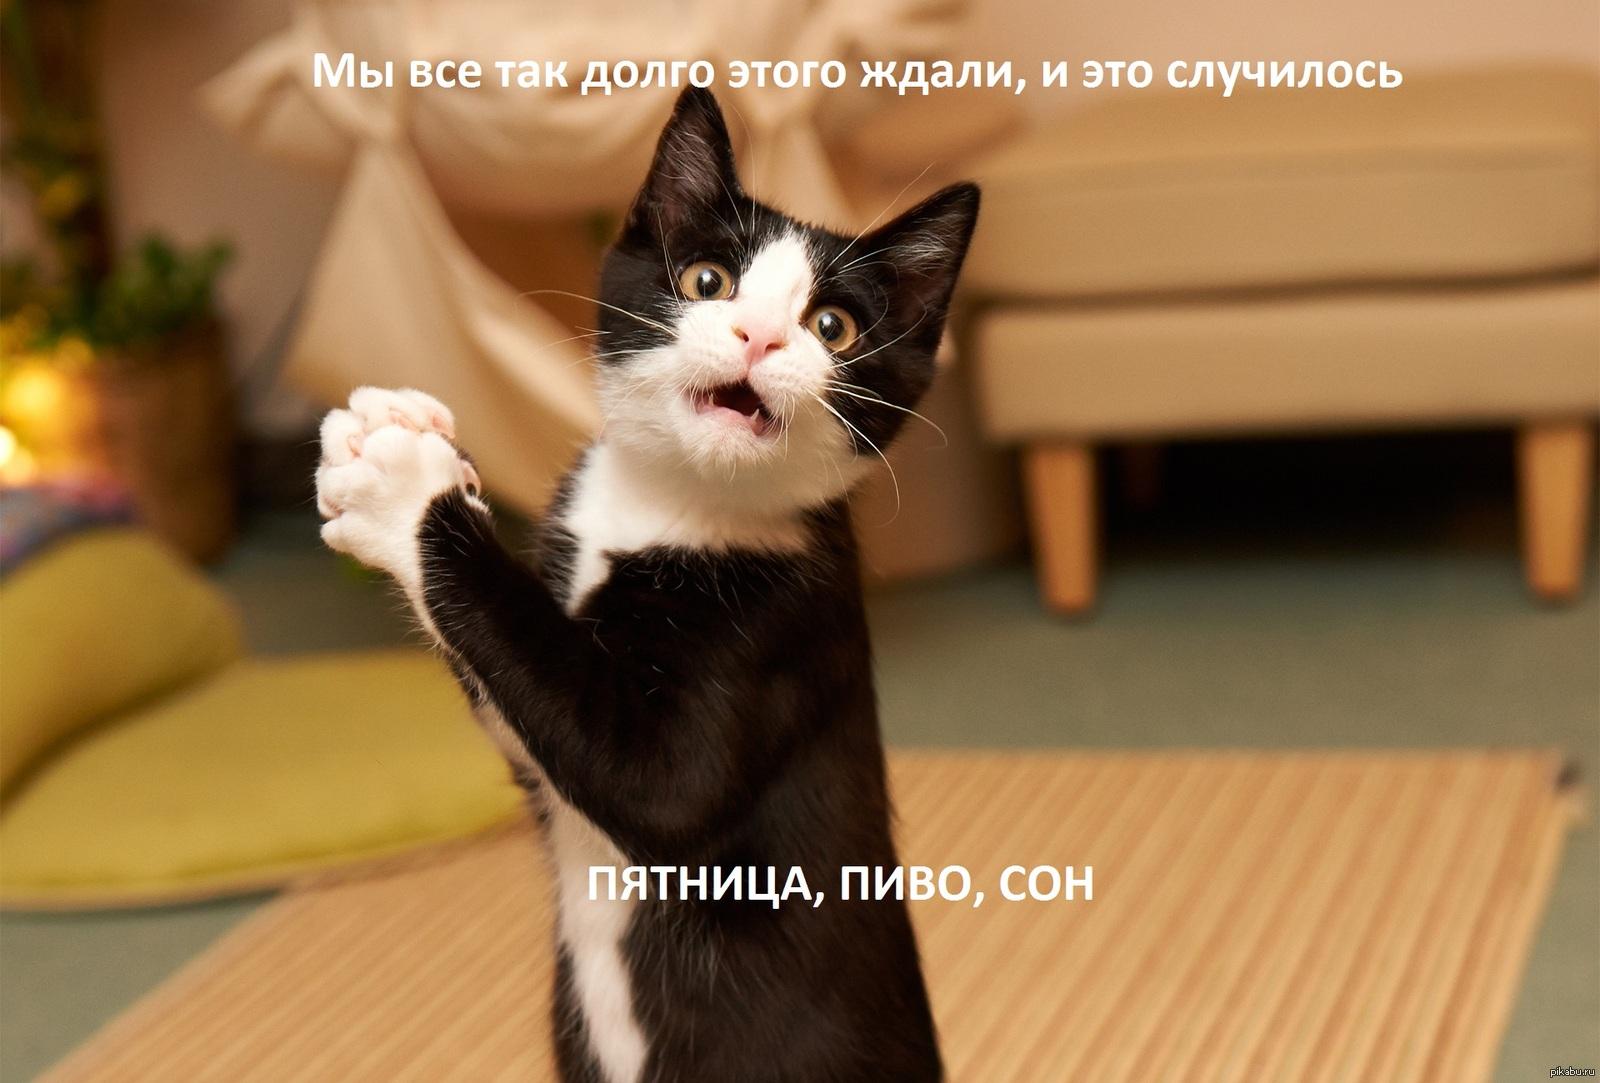 https://cs5.pikabu.ru/post_img/big/2015/02/06/5/1423204949_1422440672.jpg